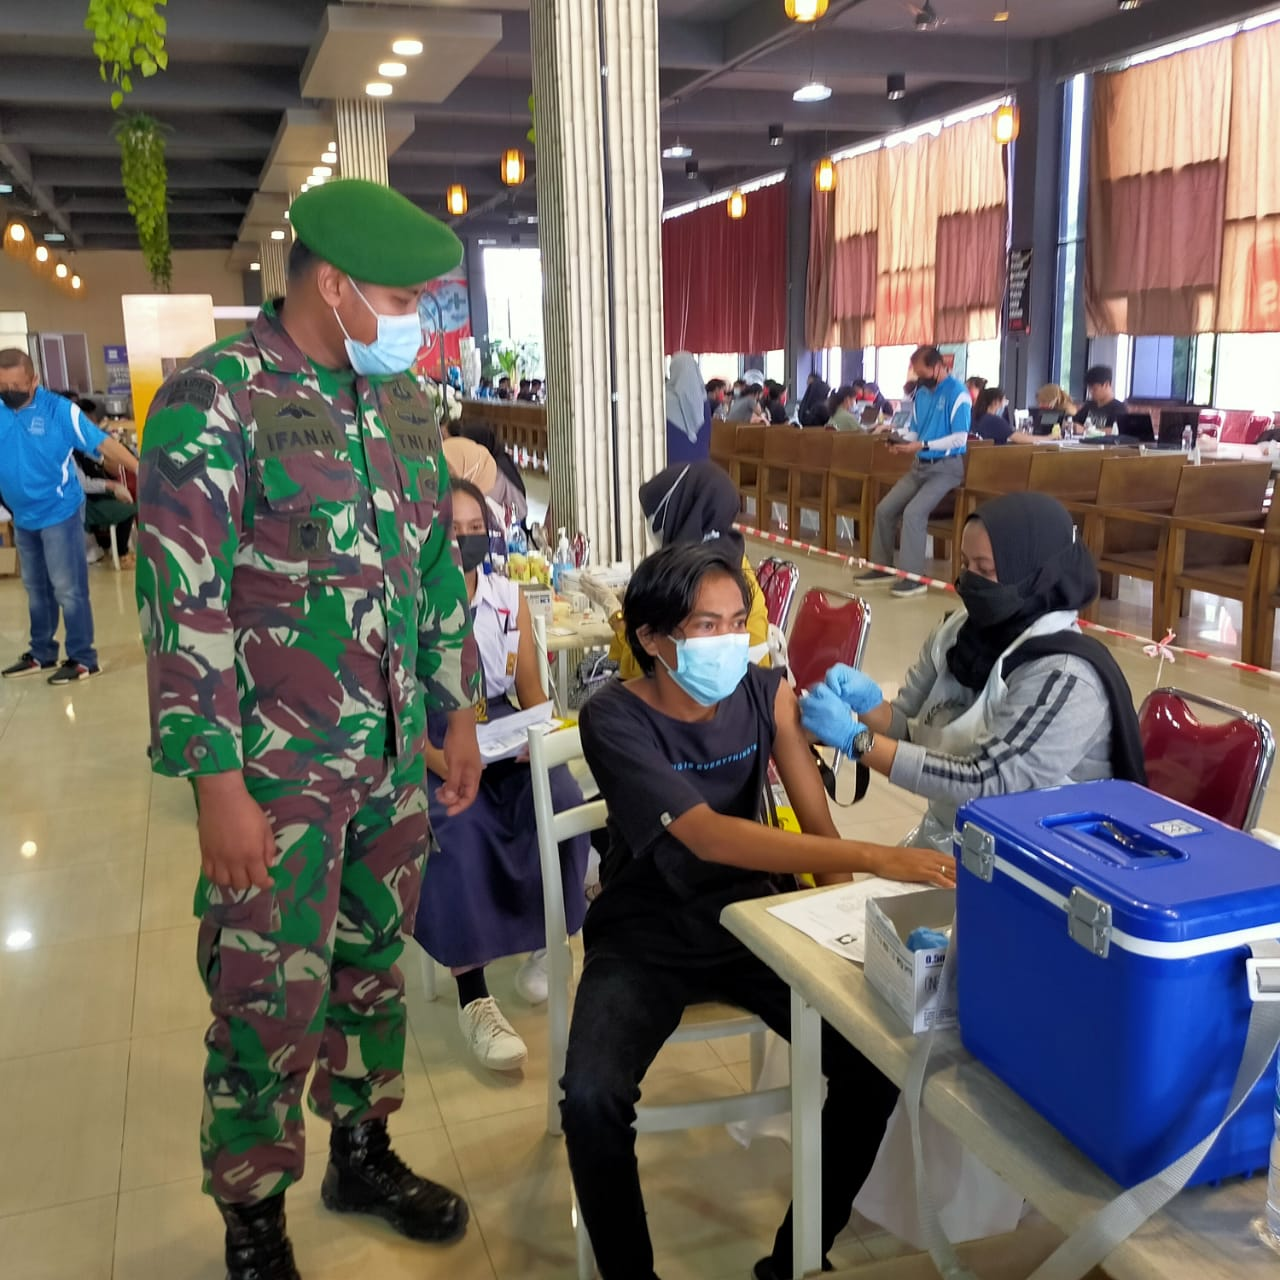 TNI - Polri Gandeng Apindo Dalam Pelaksanaan Percepatan Vaksinasi di Kota Batam